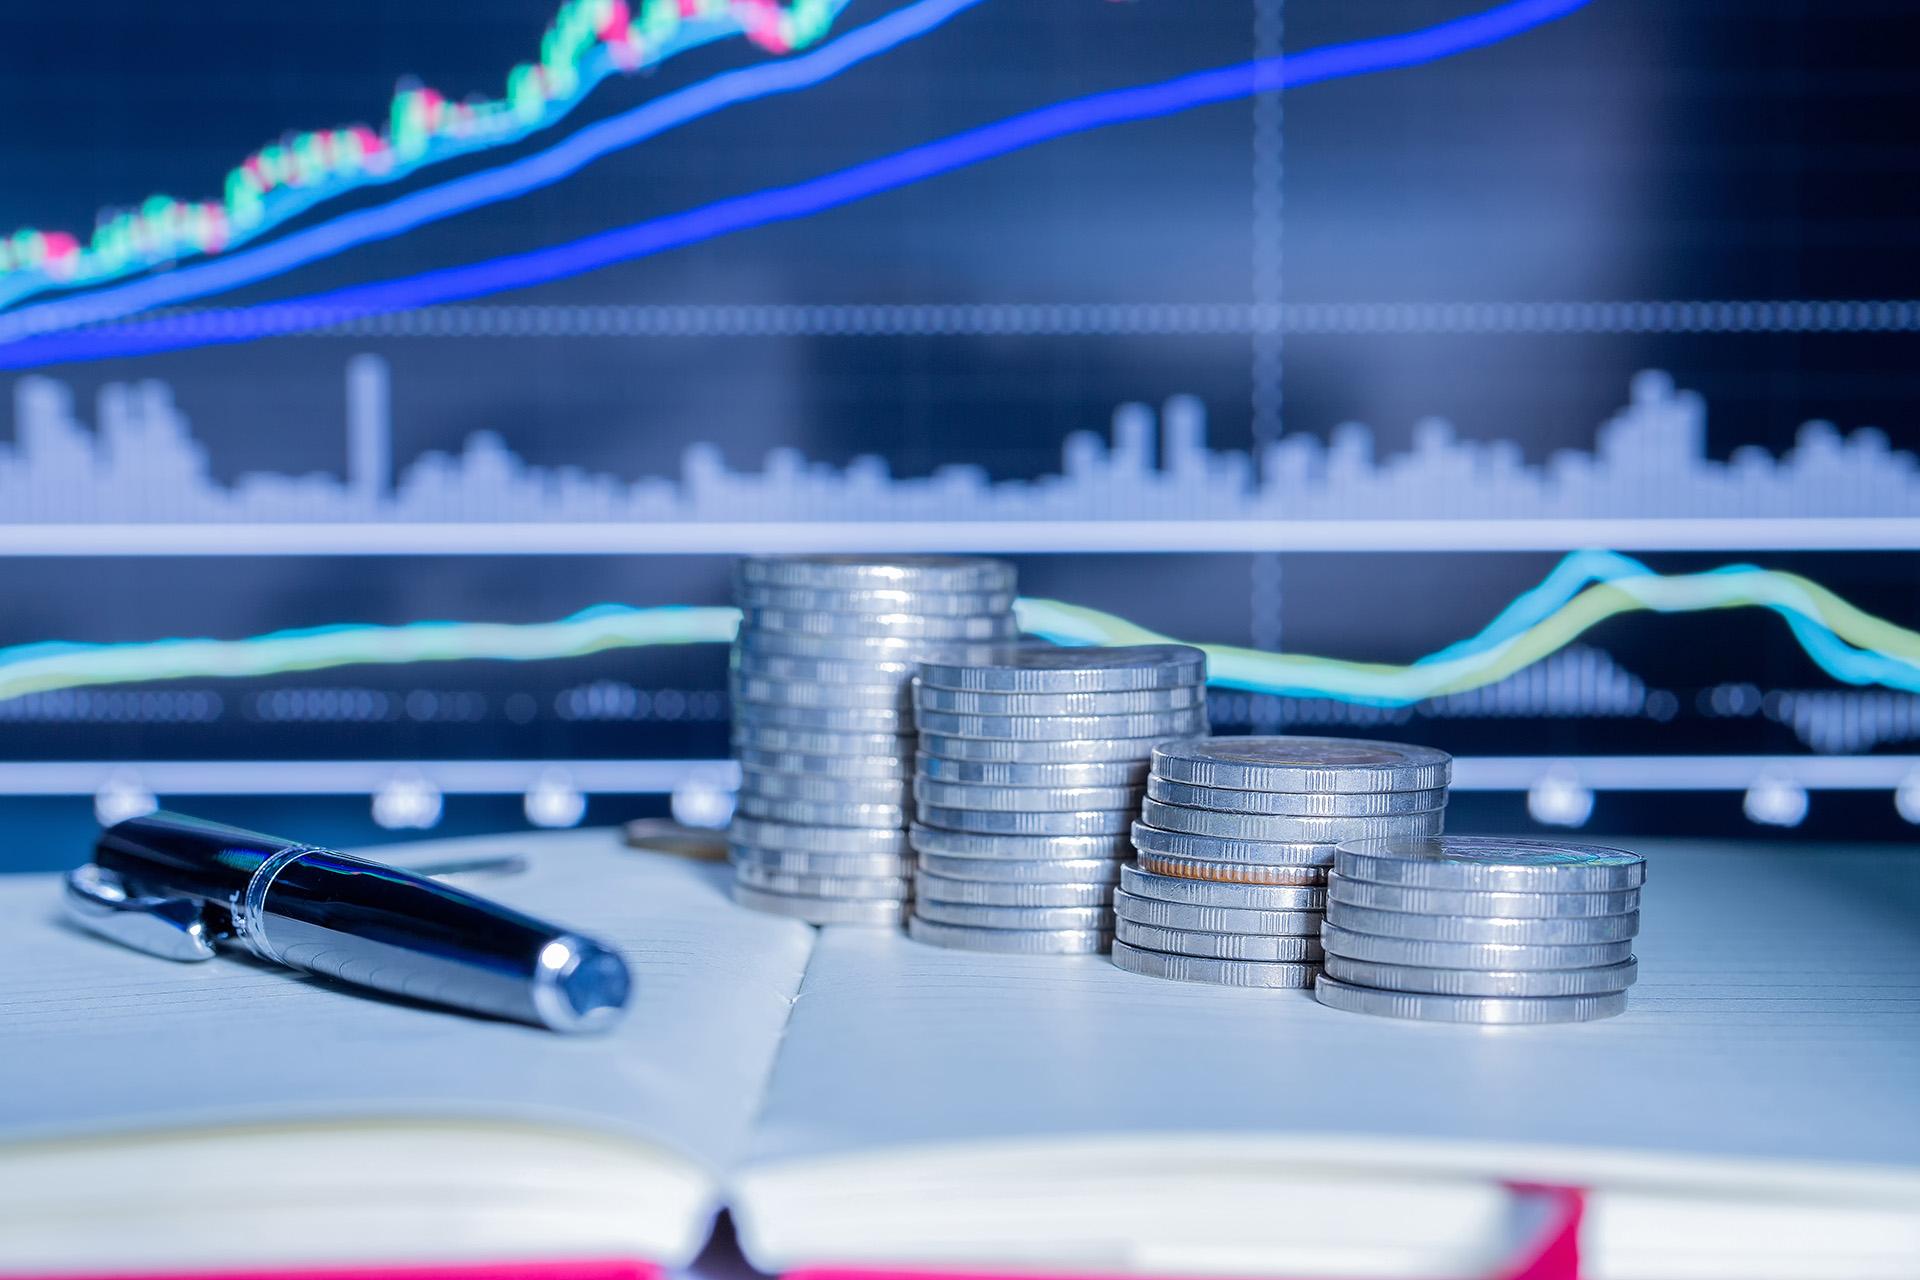 Курсы доллара и евро с сайта Центробанка на PHP